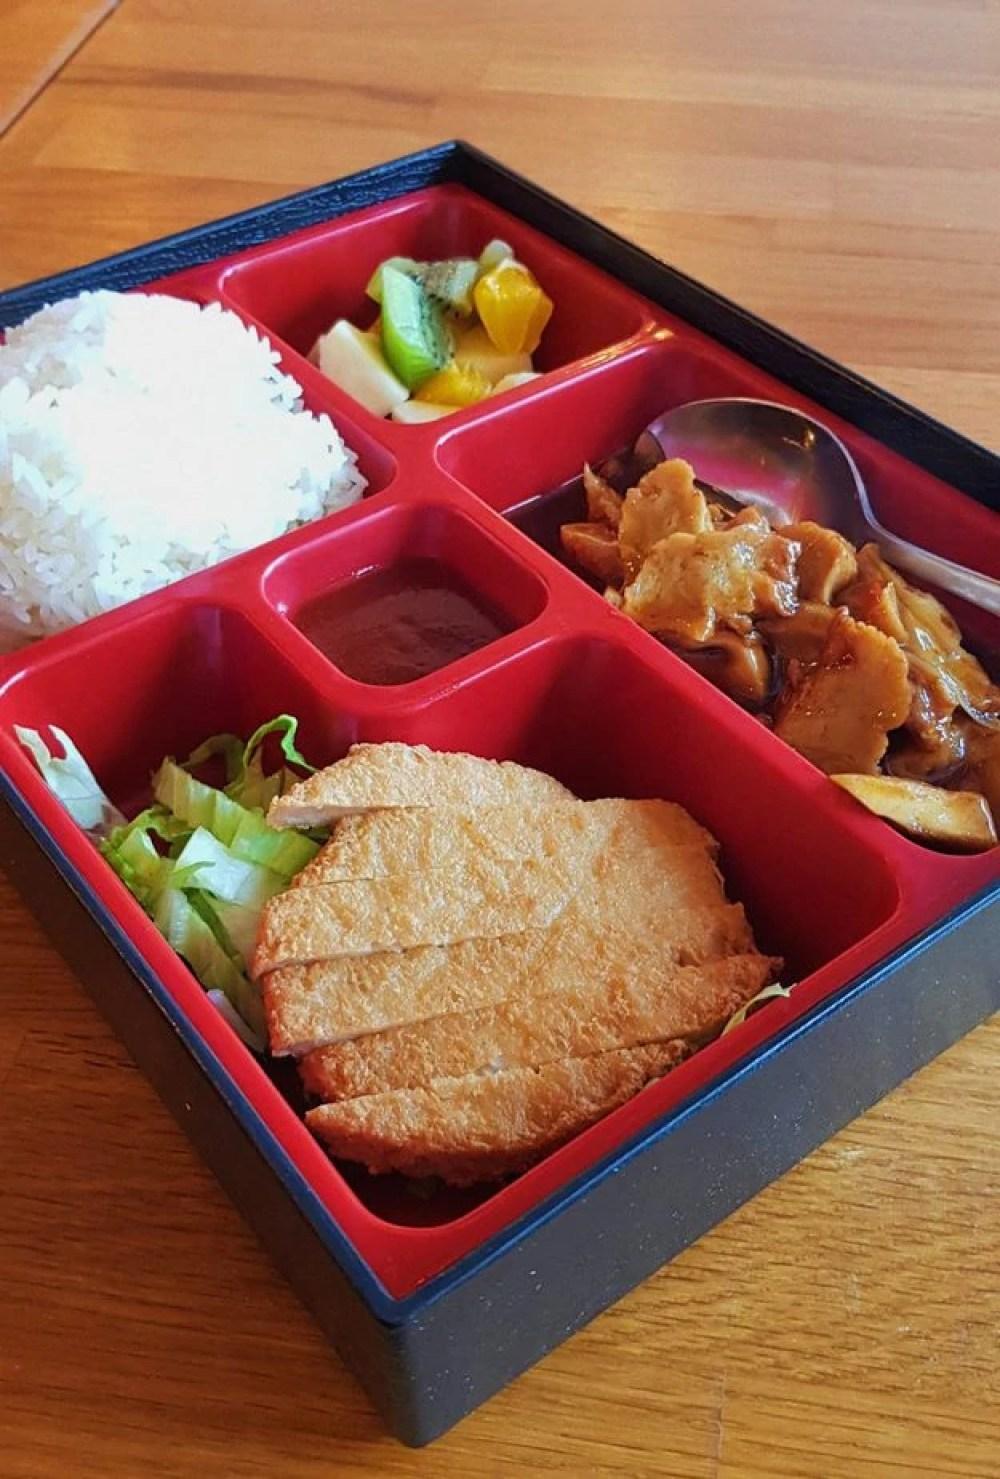 Vegan Daily Bento Box at Vegebowl in Paris